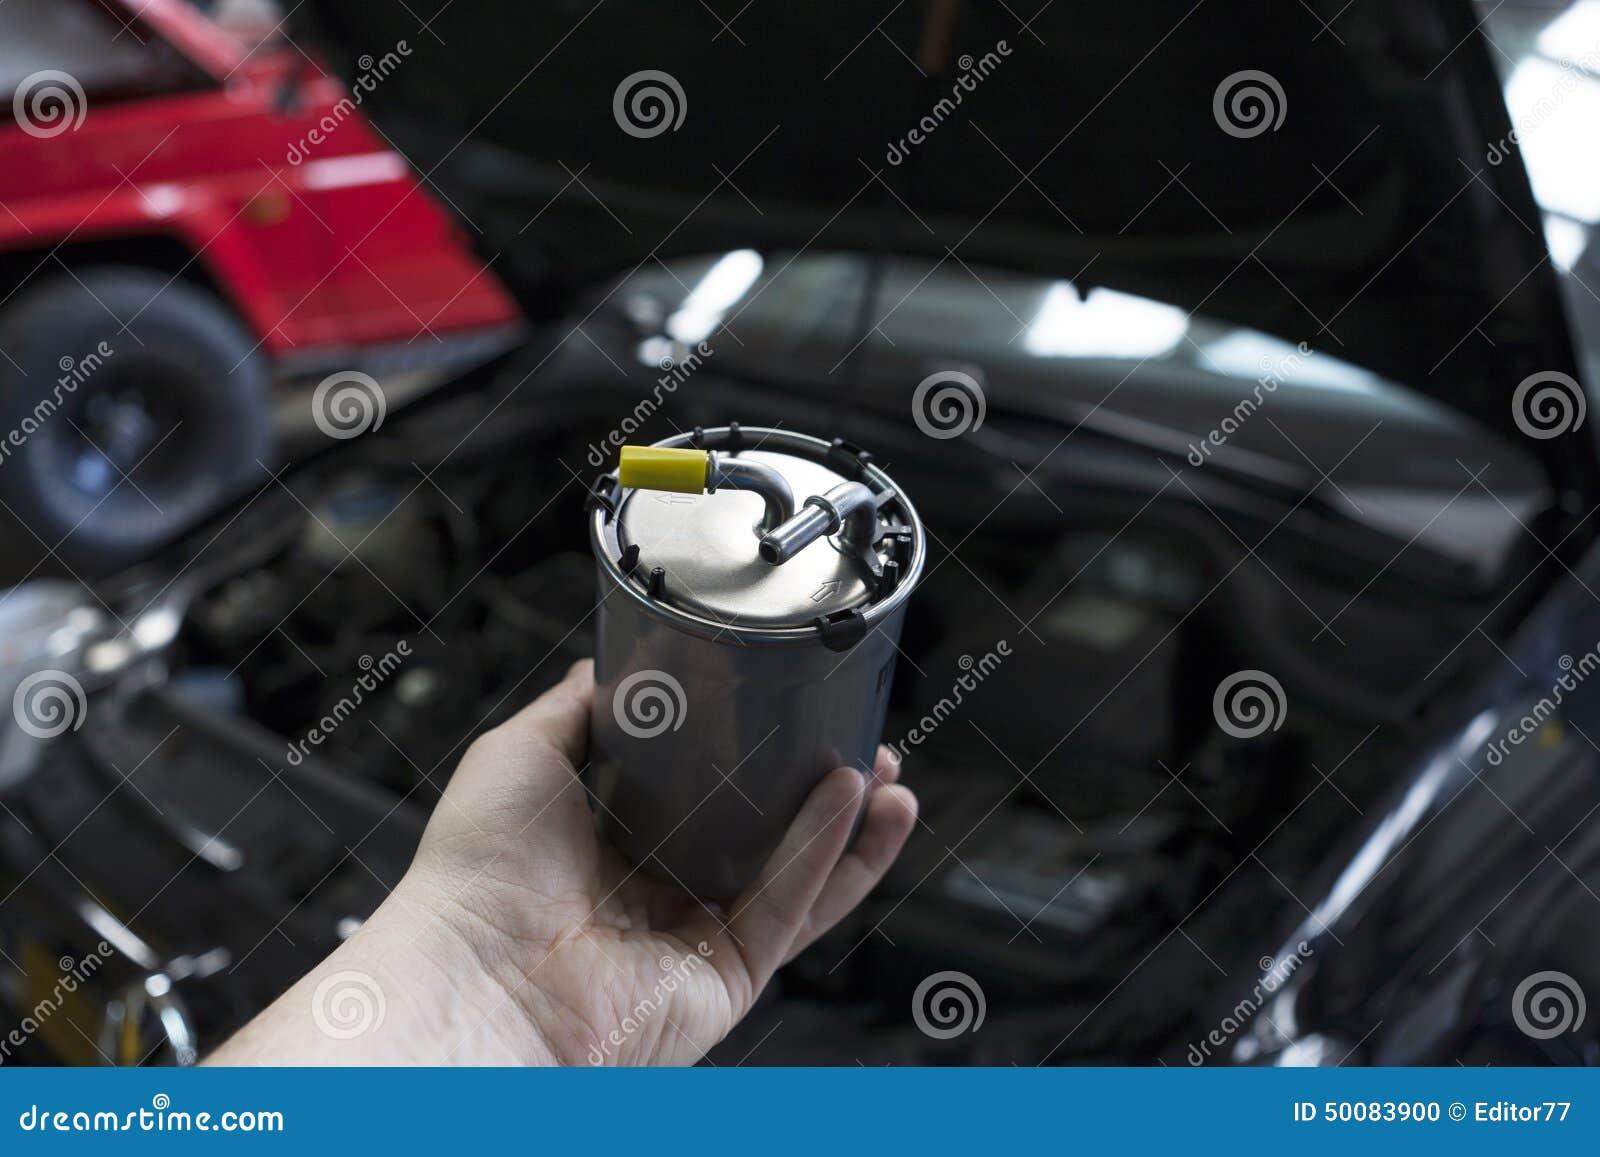 pictures of diesel fuel filter inside best wiring library diesel fuel filter head pictures of diesel fuel filter inside #3